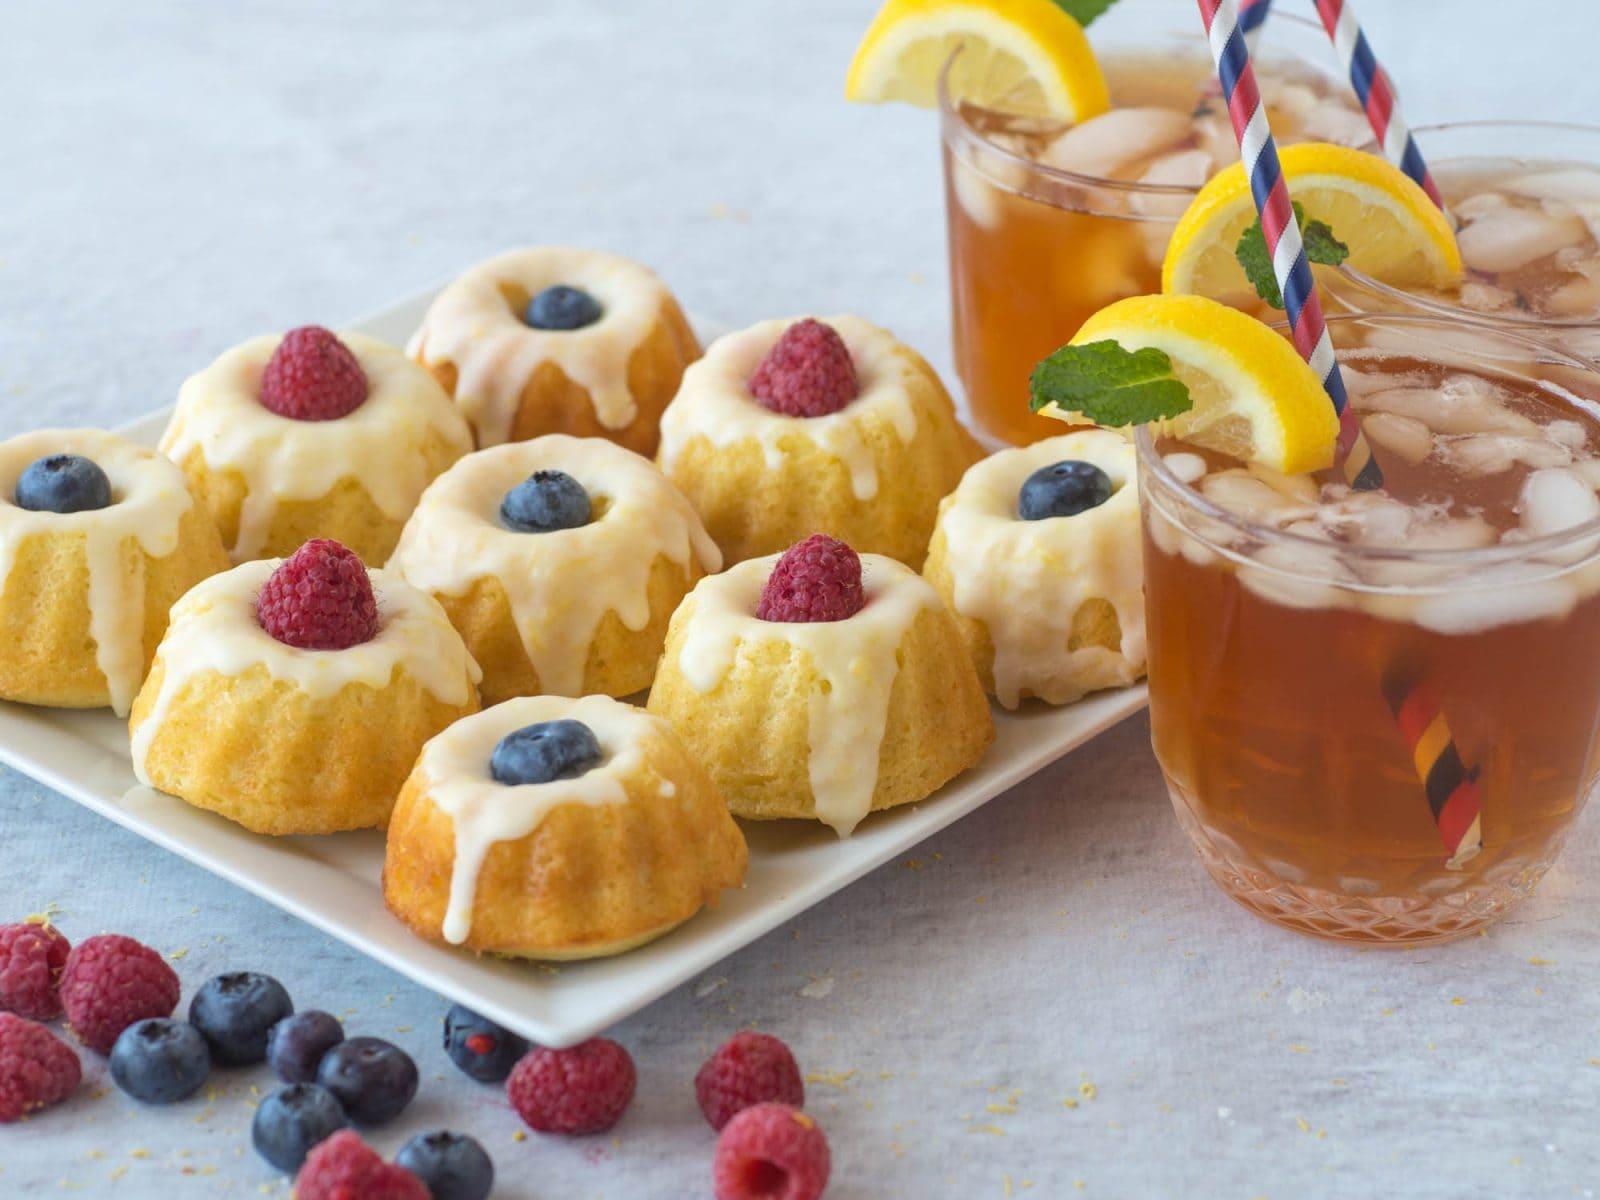 Serving mini lemon bundt cakes with iced tea